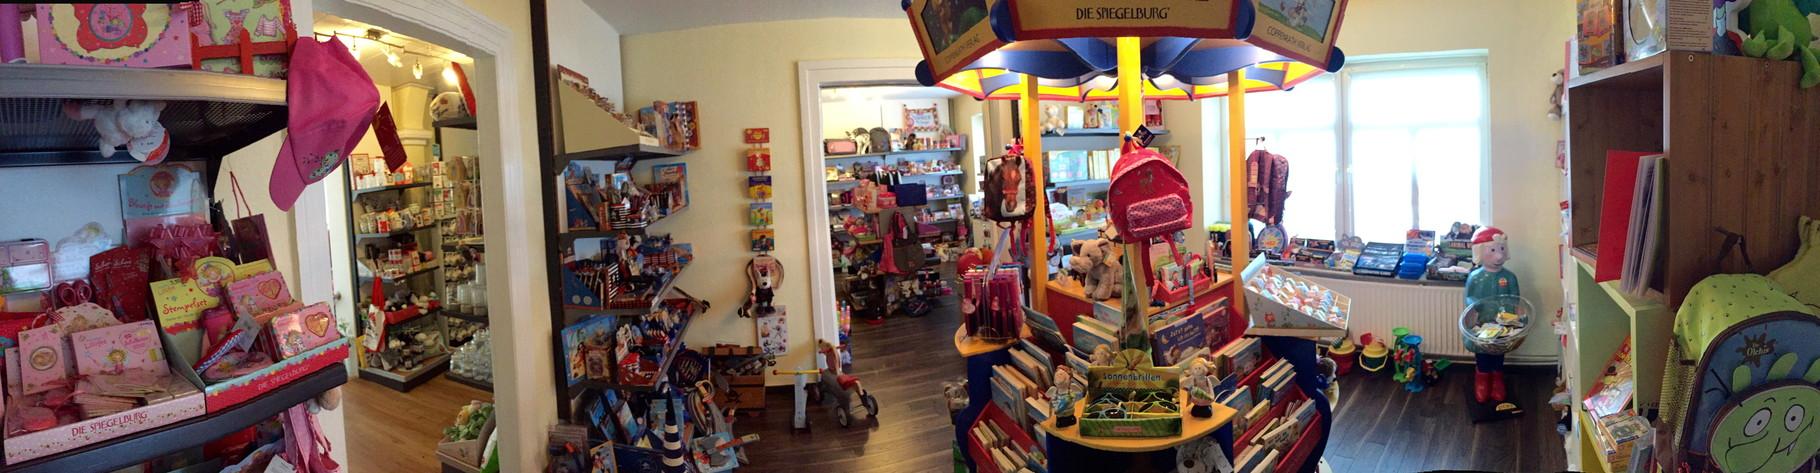 Blick in den Kinderladen